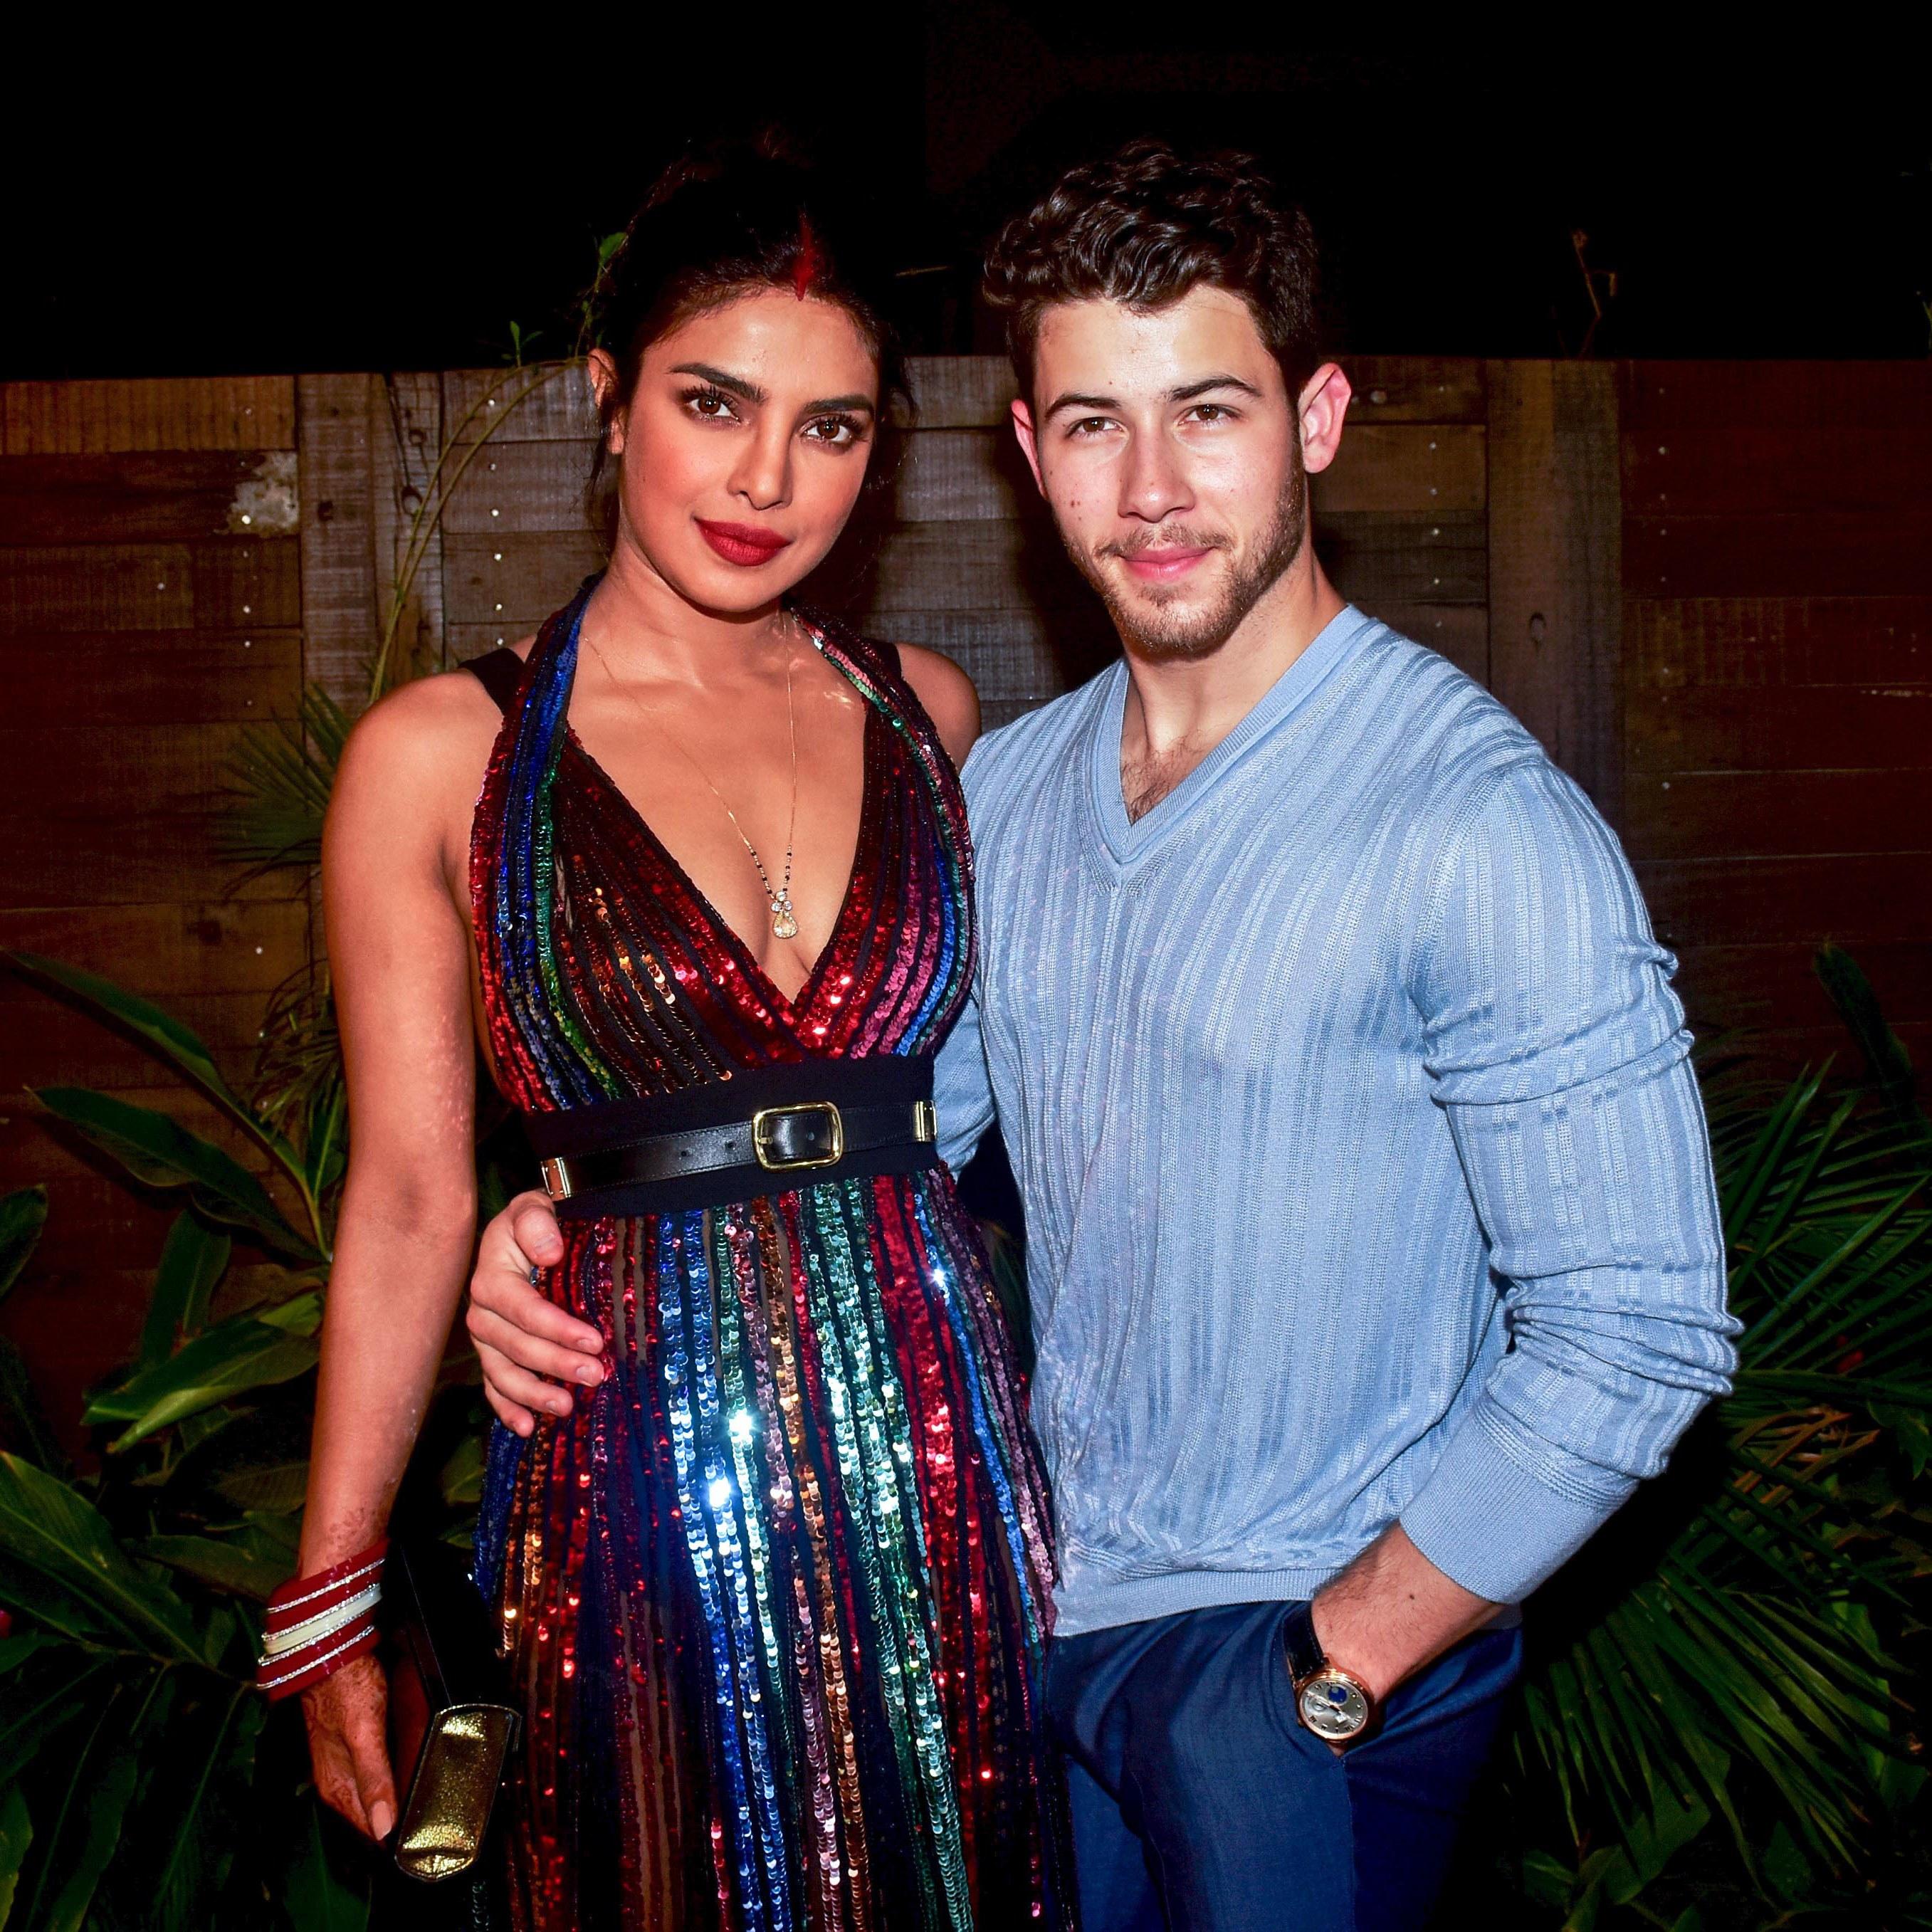 Will We See Priyanka Chopra And Nick Jonas Together In A